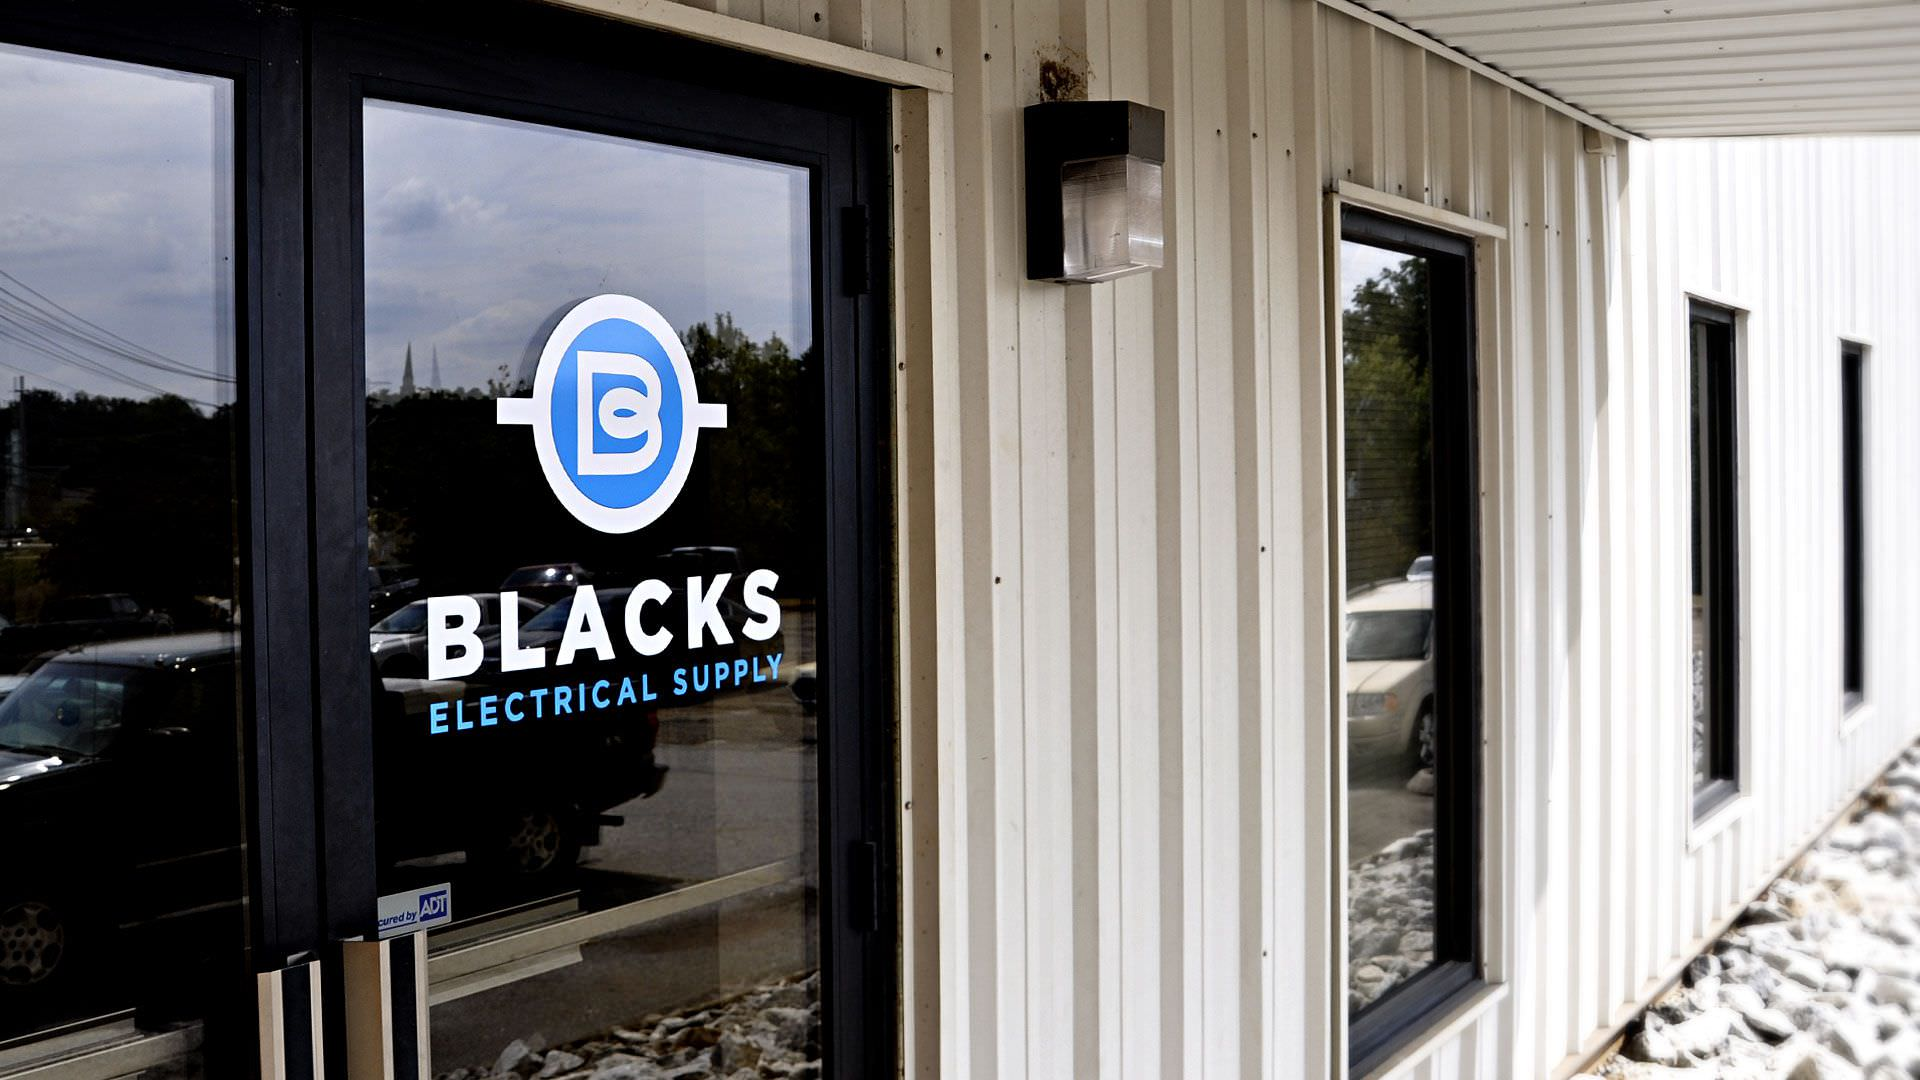 Branding Greenville based Blacks Electrical Supply - - Branding Greenville Headquarters Entrance